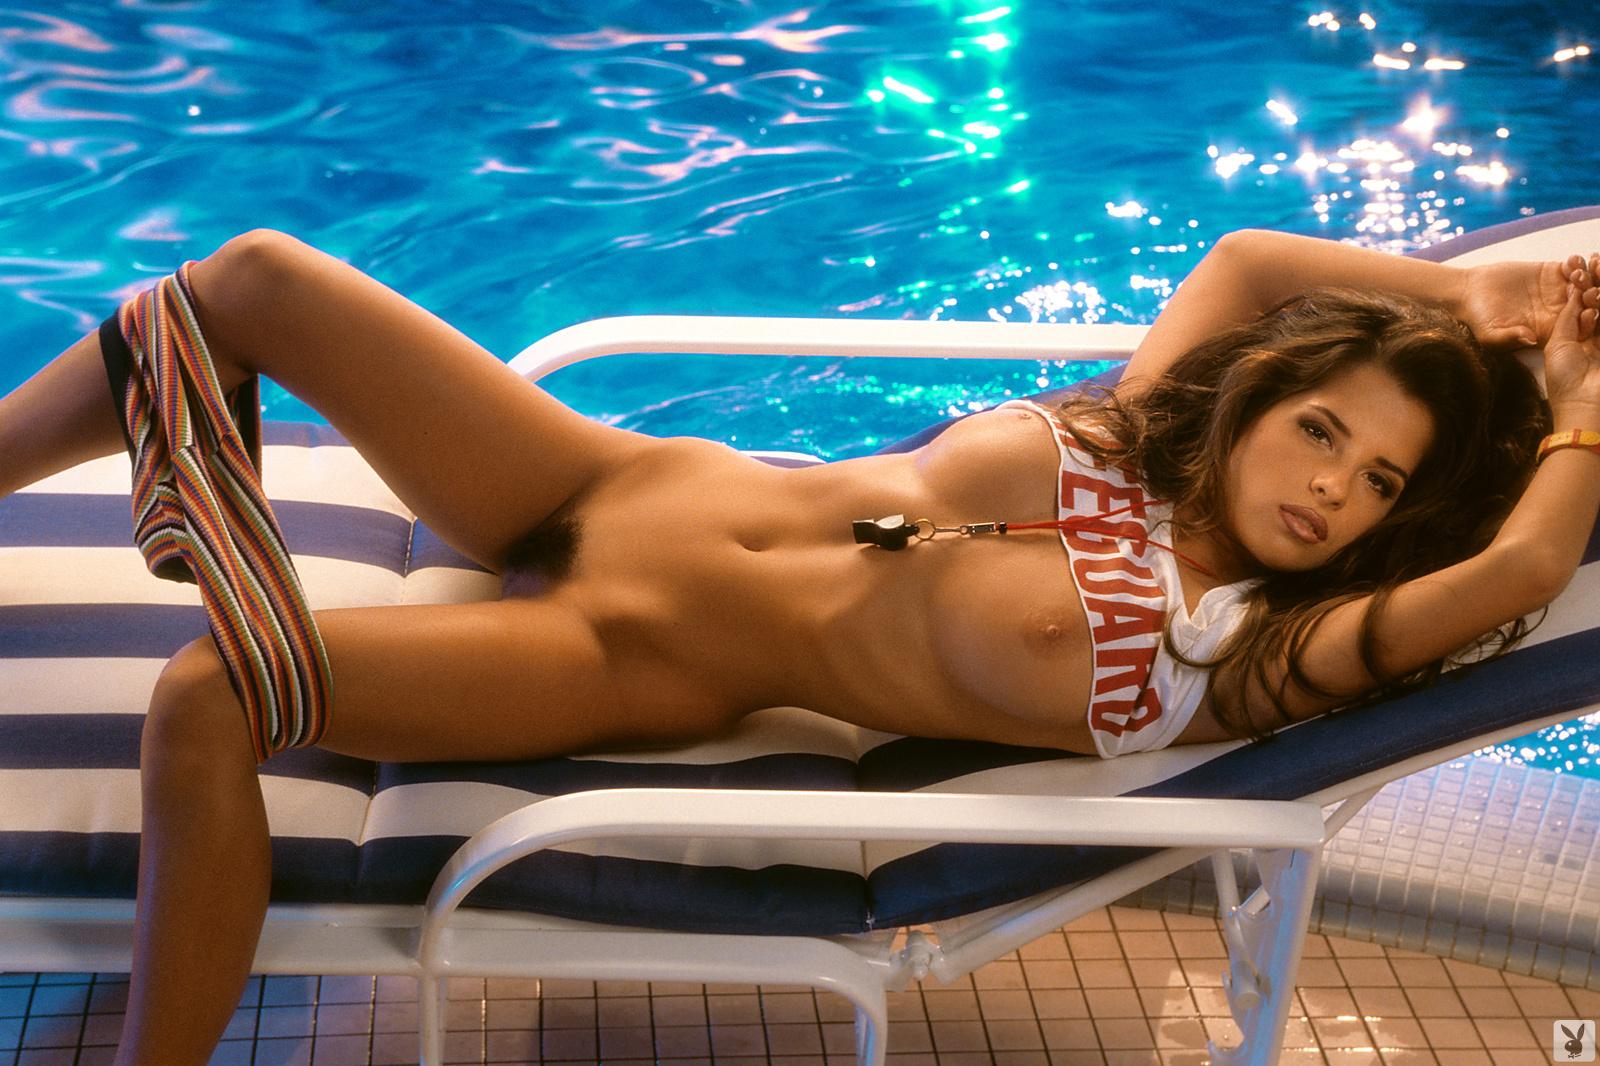 kelly-monaco-nude-lifeguard-tits-pussy-wet-playboy-21